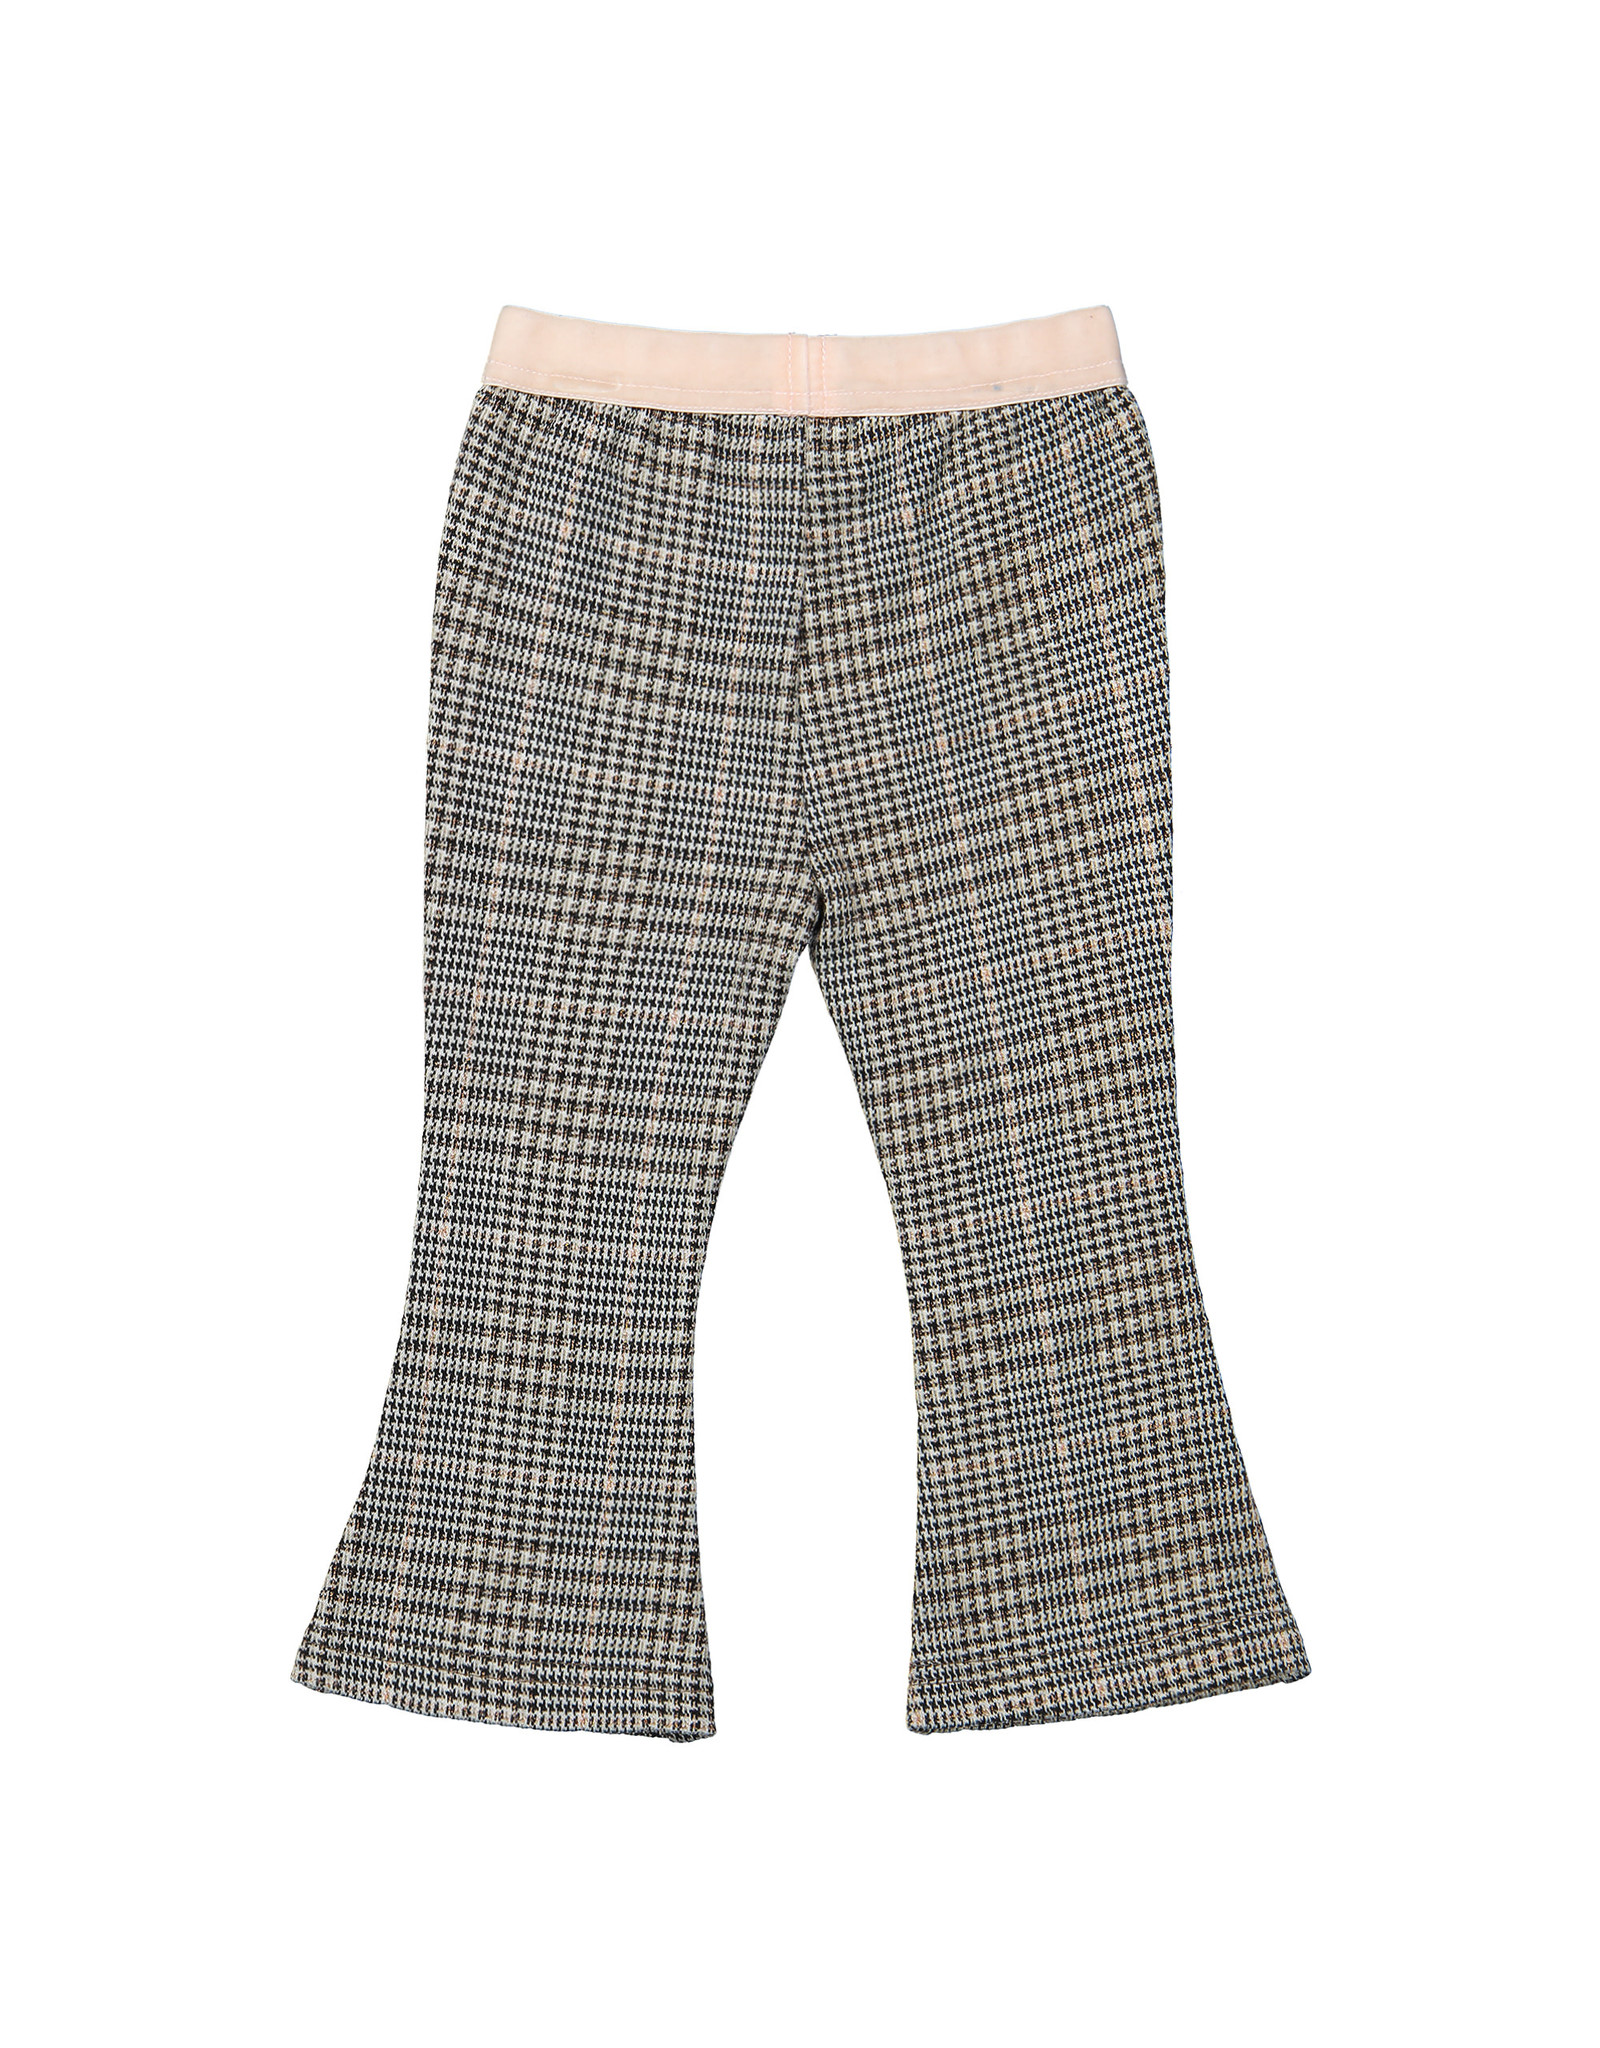 Koko Noko Koko Noko meisjes geruiten flaired pants Grey